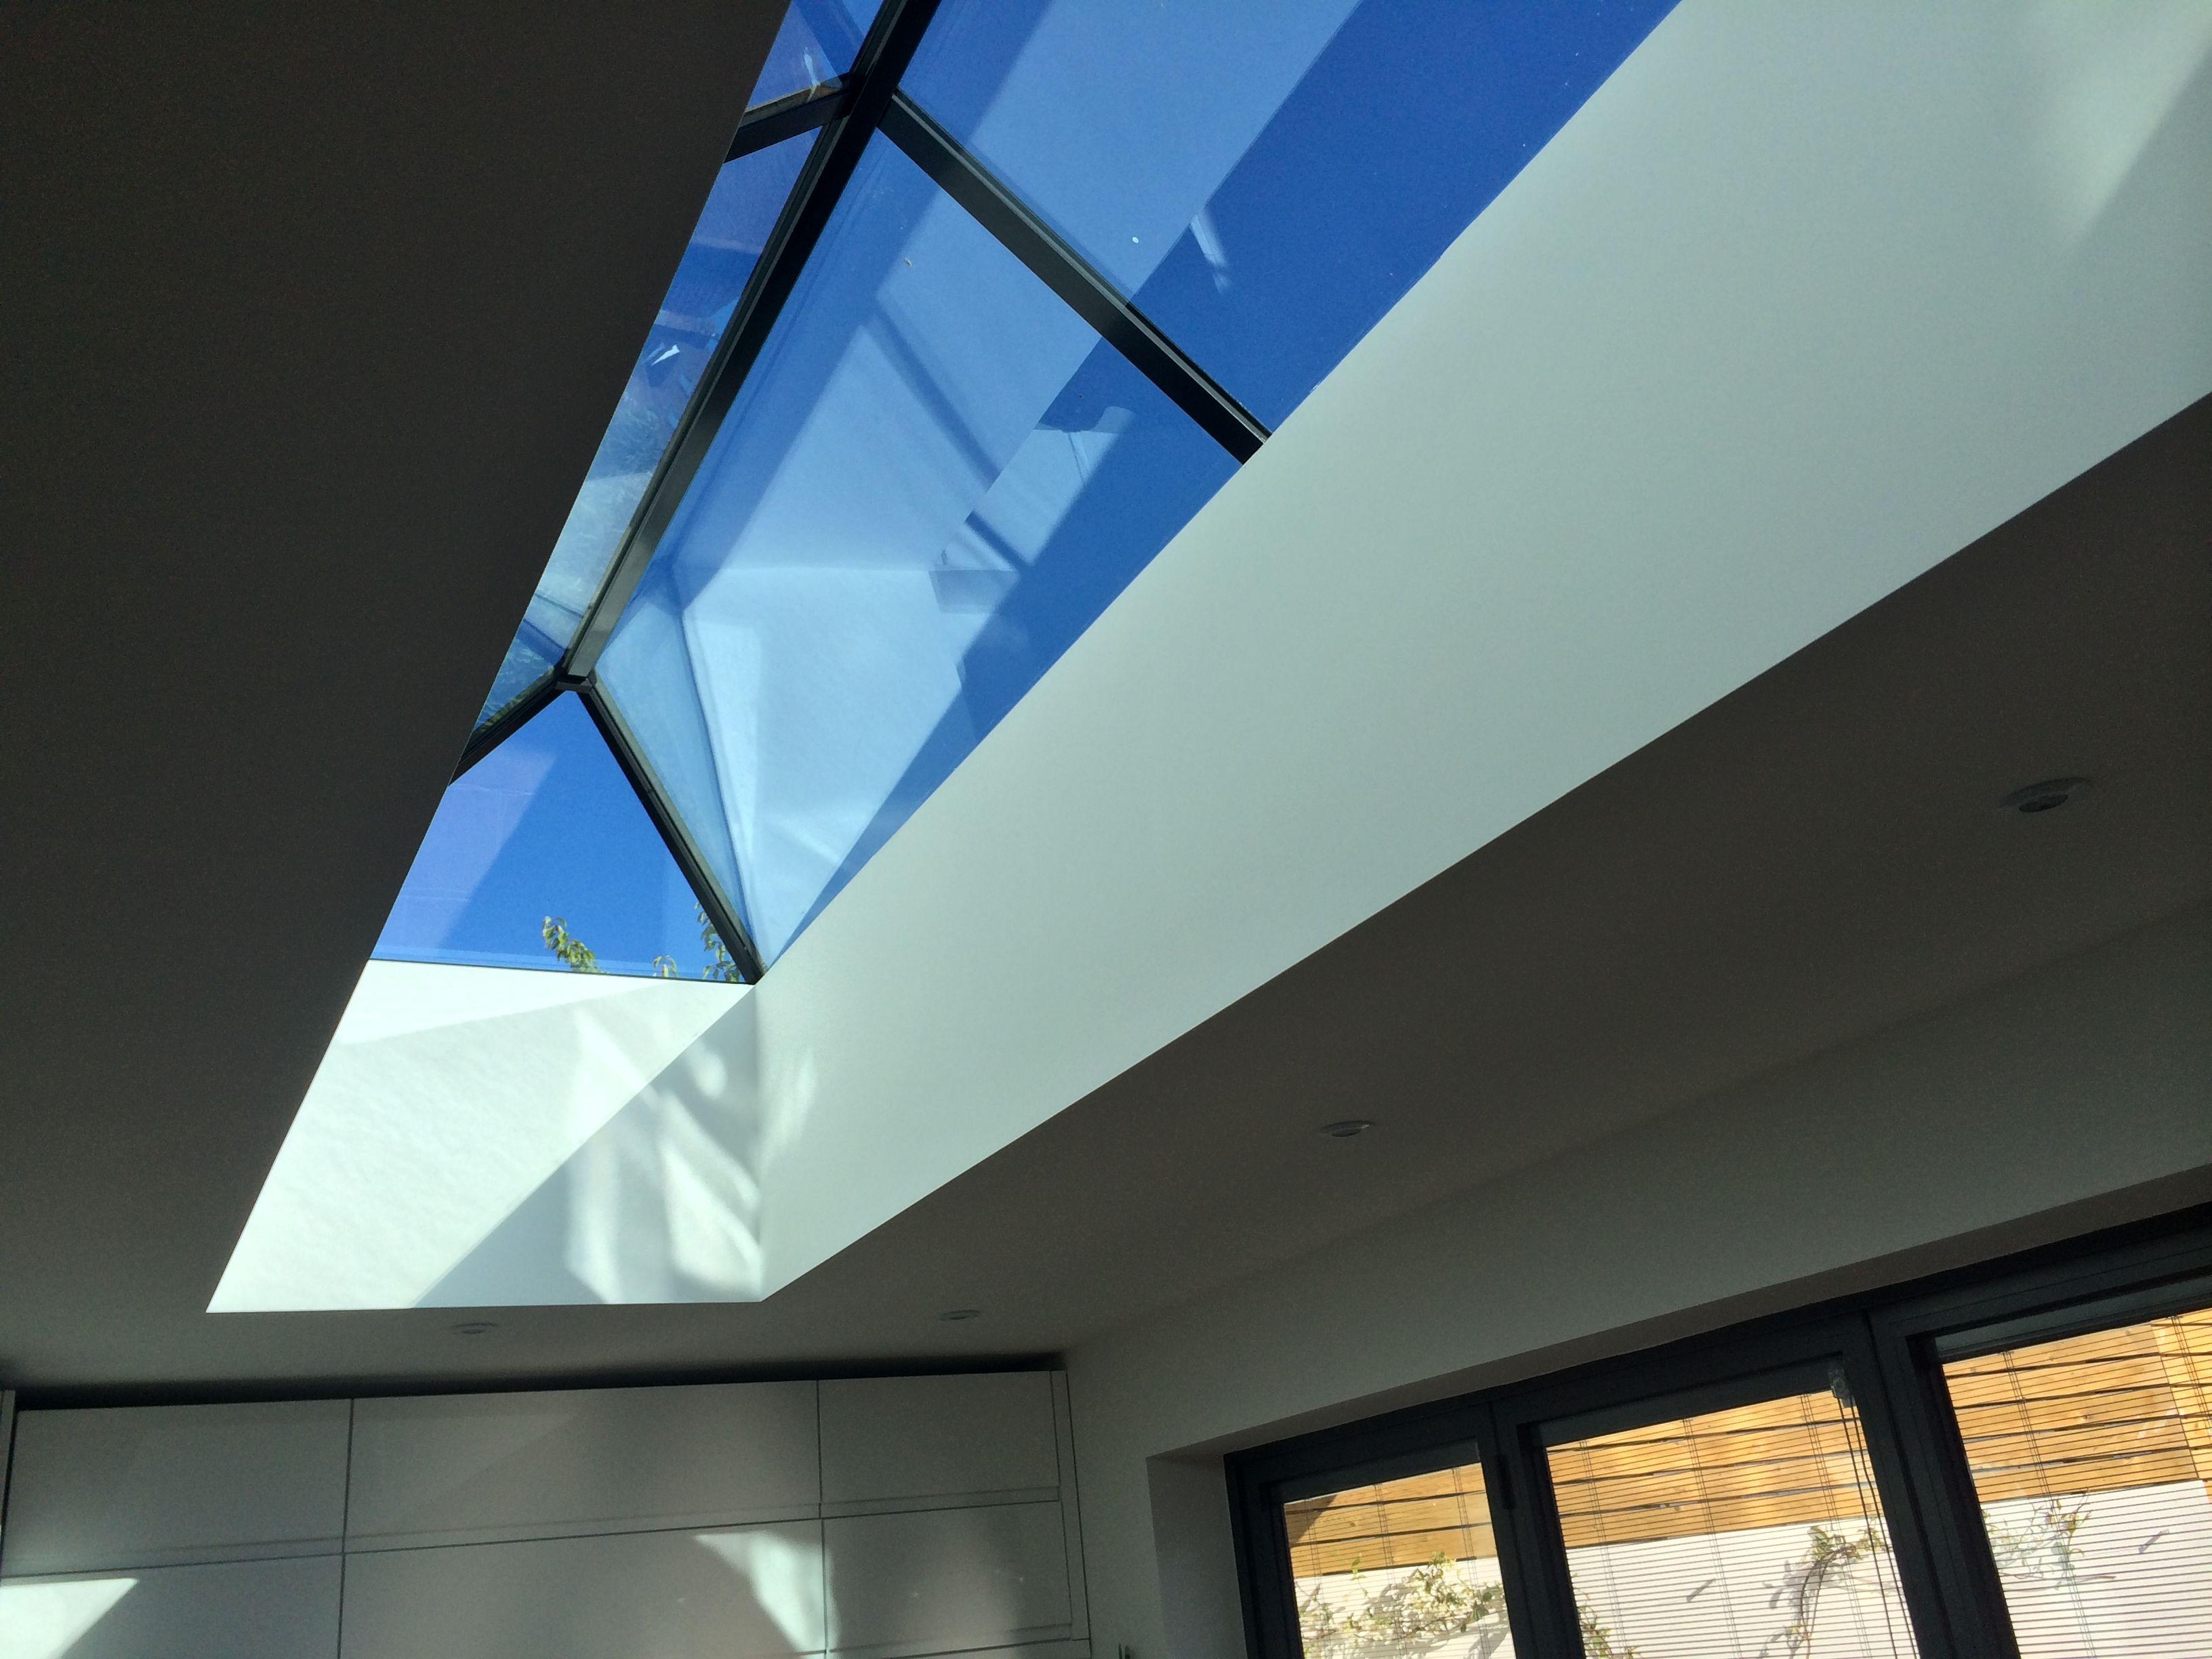 4 X 1 M Contemporary Roof Lantern Double Glazed Marine Grade Powder Coated Aluminium Fantastic U Value Roof Architecture Modern Roofing Roof Design